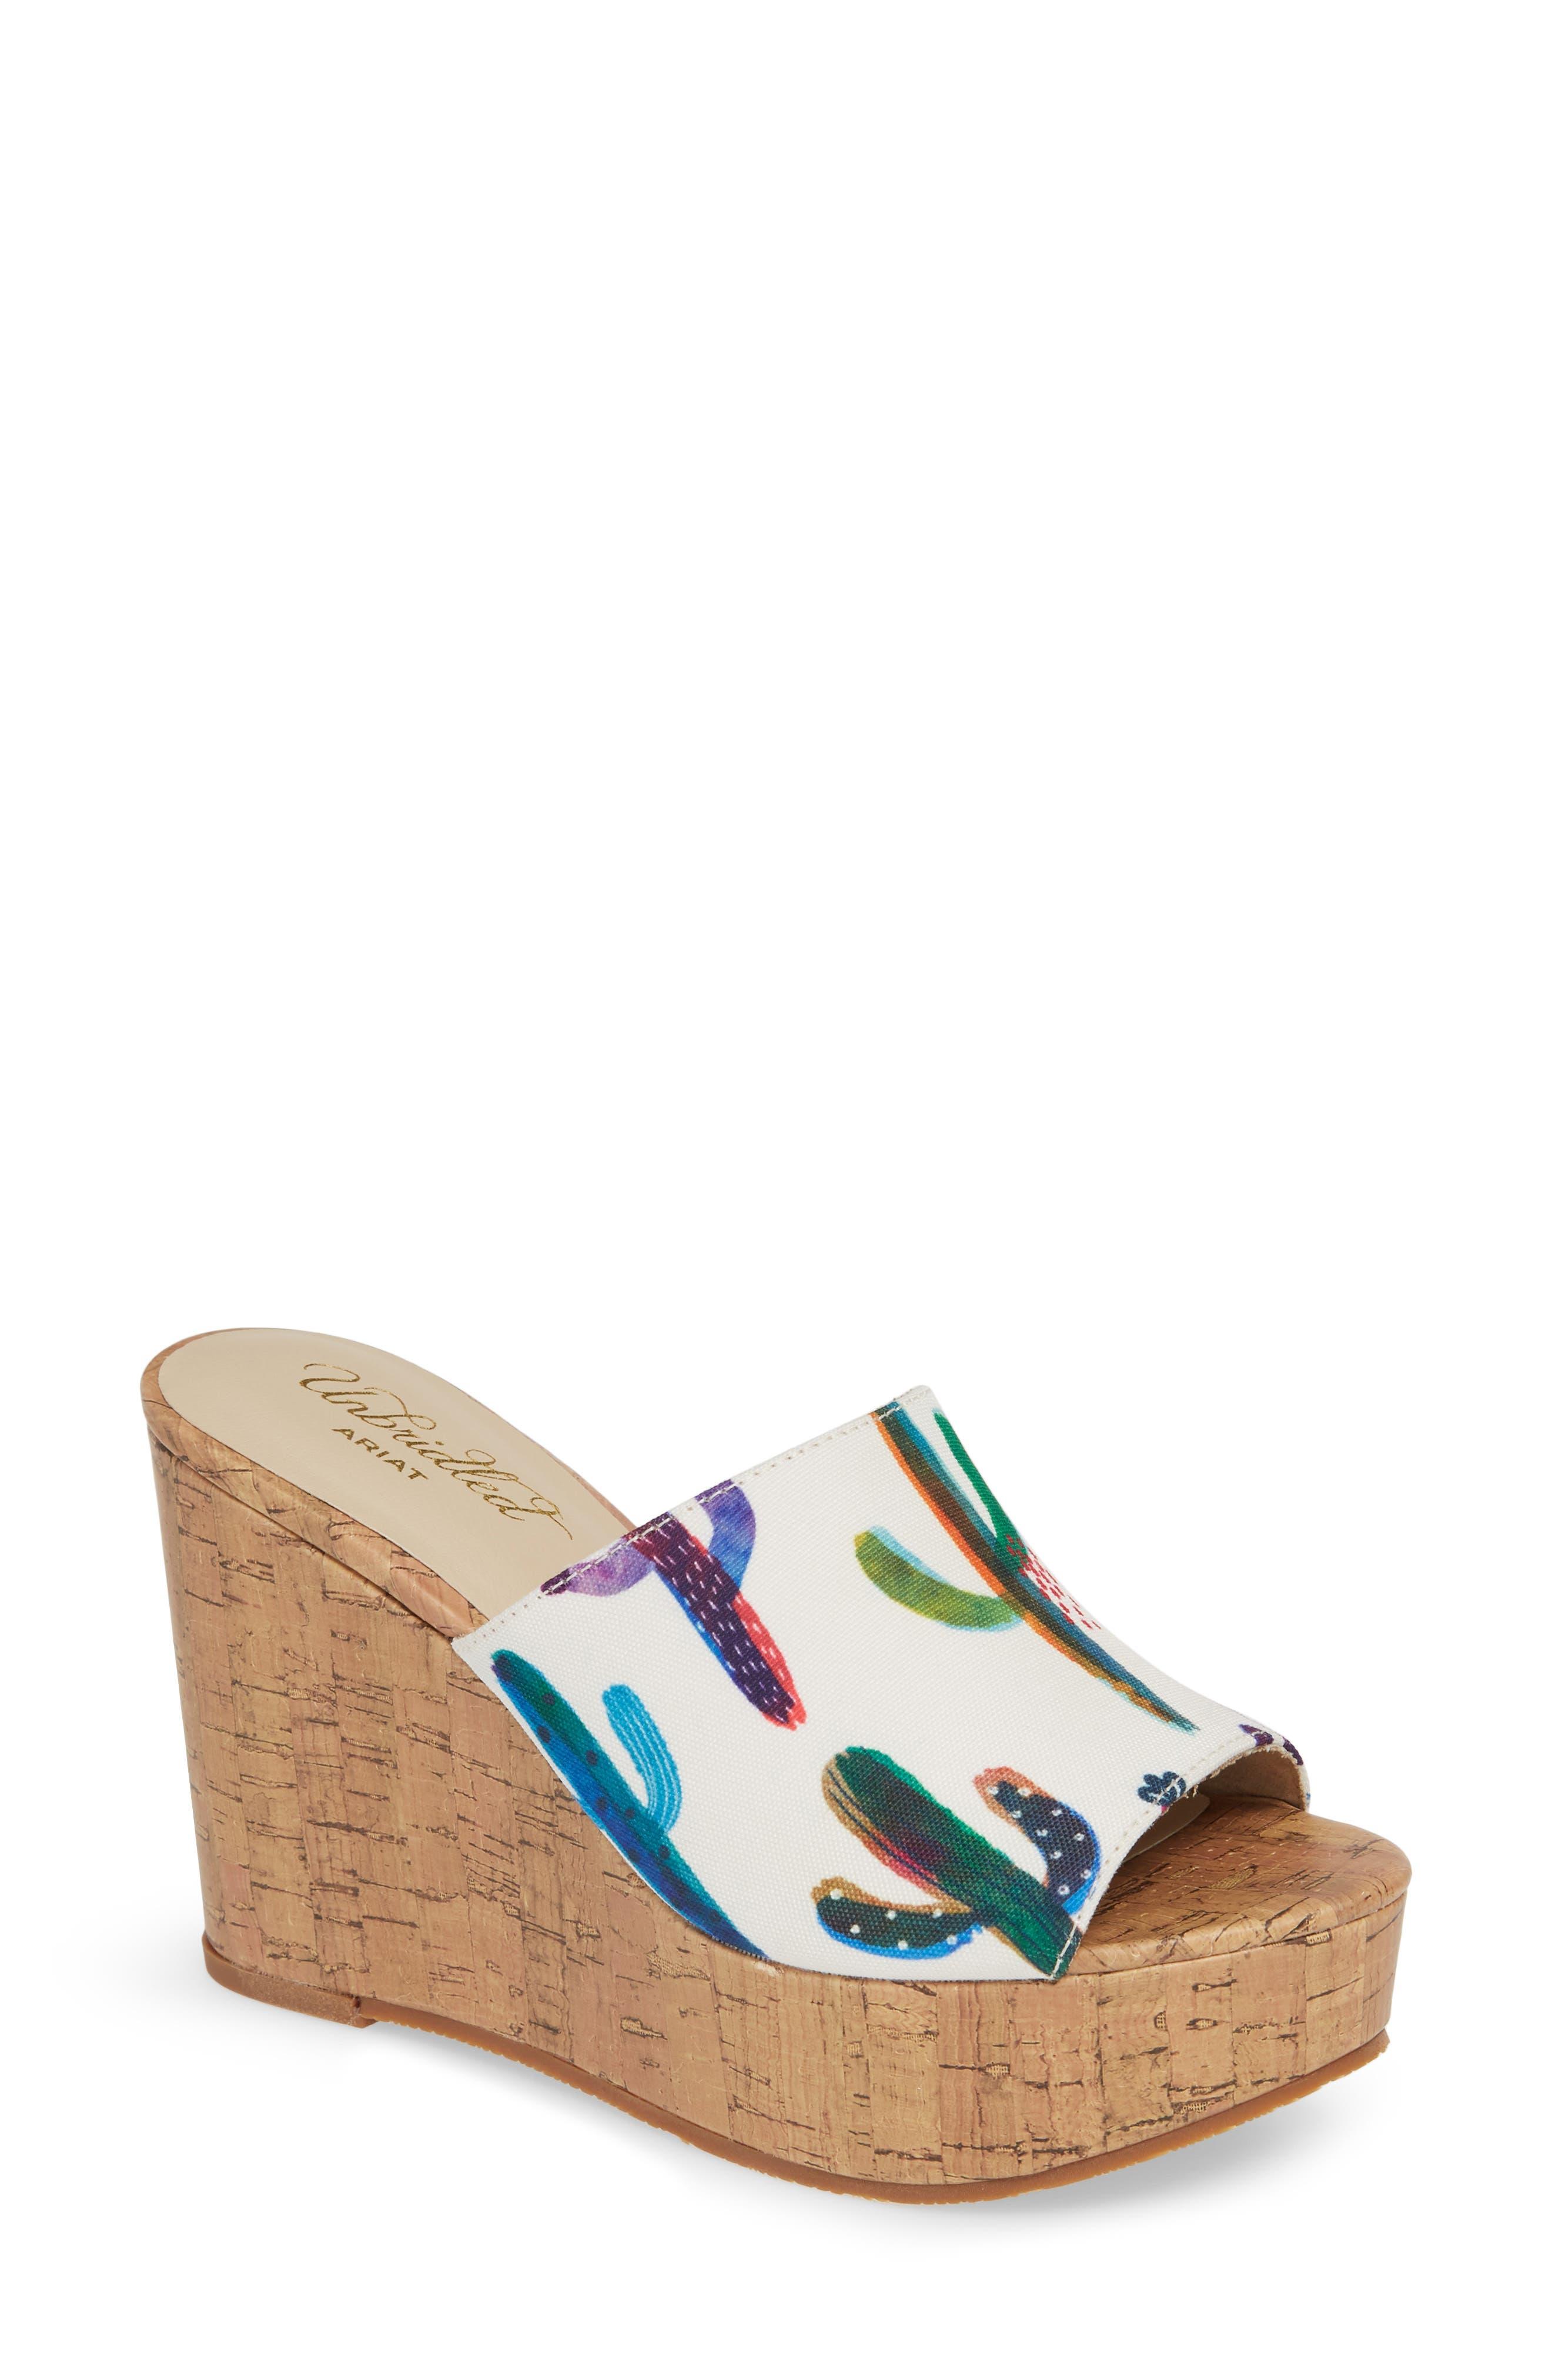 ARIAT, Layla Wedge Slide Sandal, Main thumbnail 1, color, CACTUS PRINT FABRIC